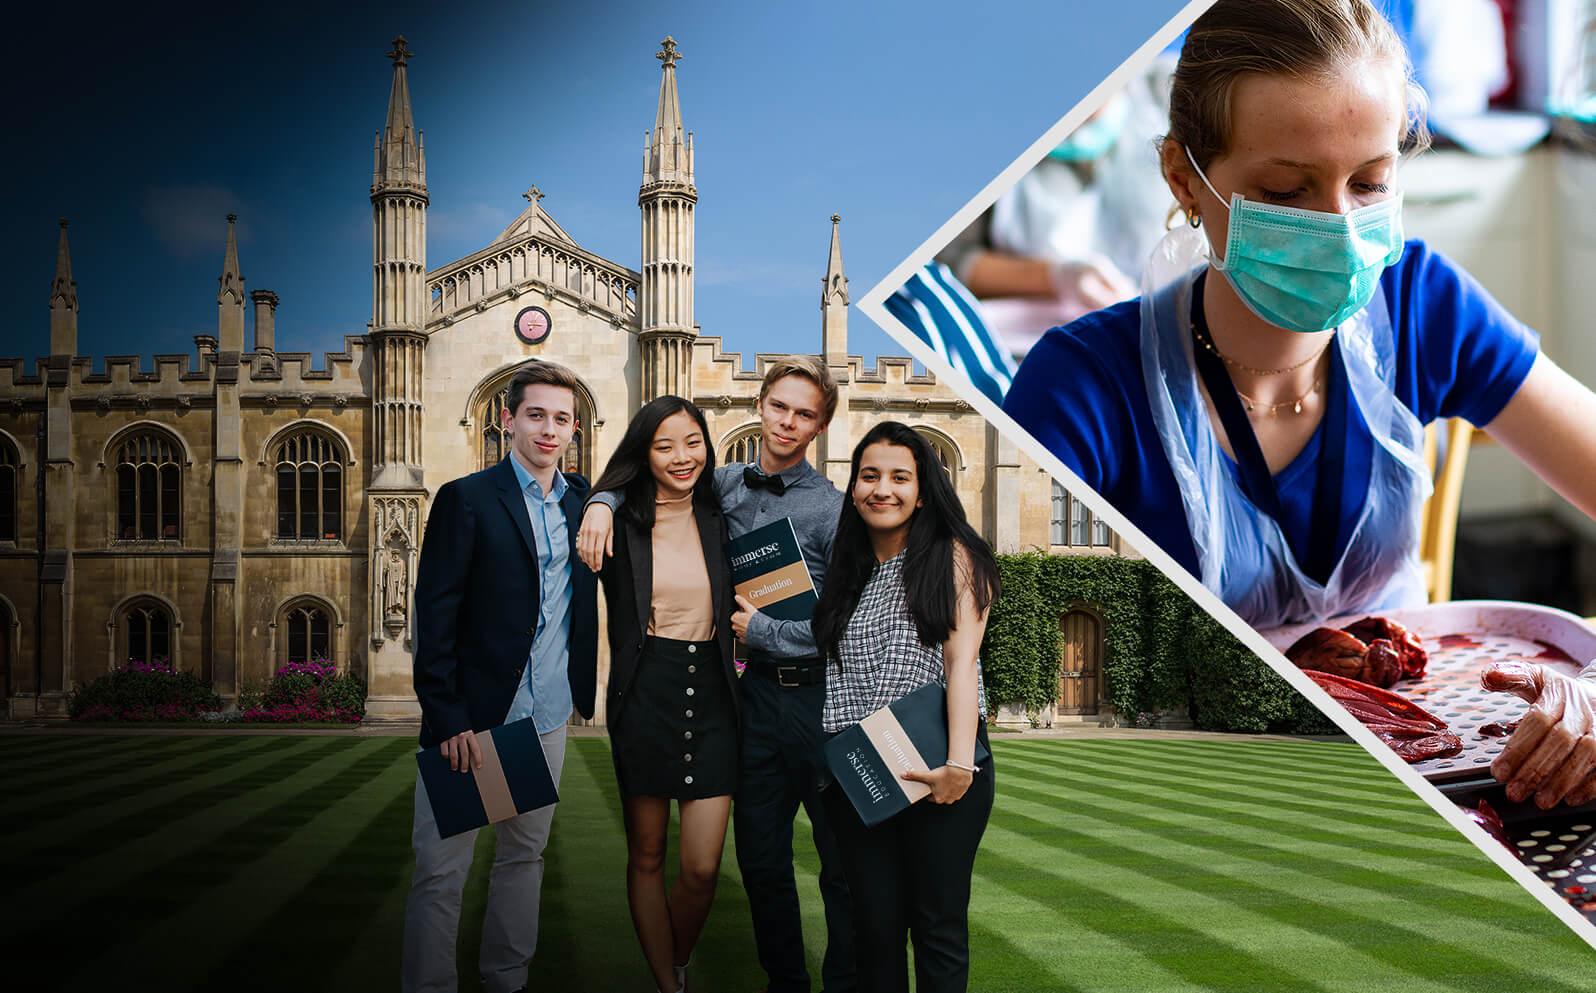 Cambridge Medicine Summer Program for Ages 13-15